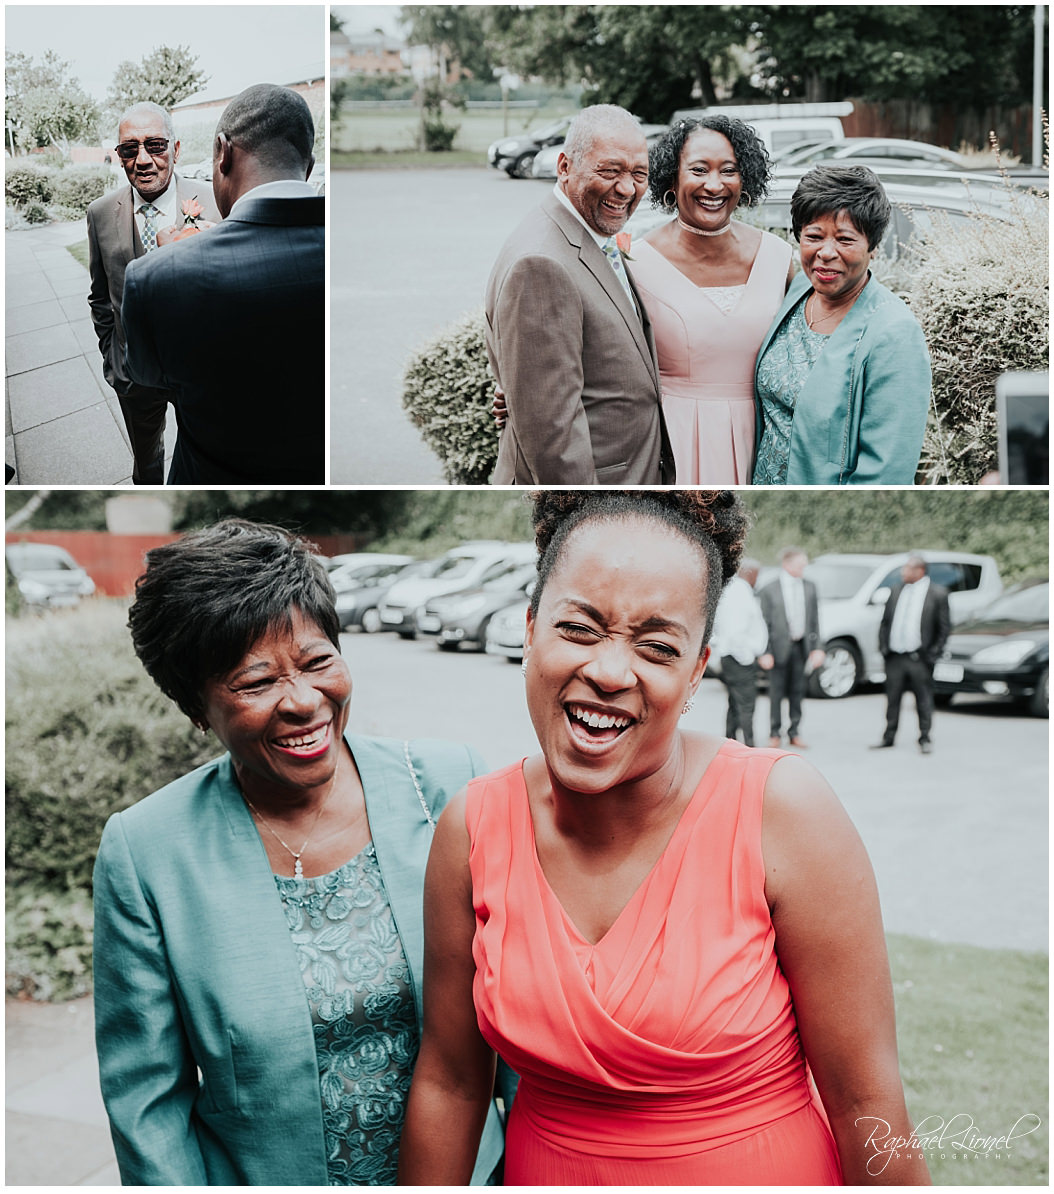 Asimplewedding02 - Roy and Donna - A Simple Wedding